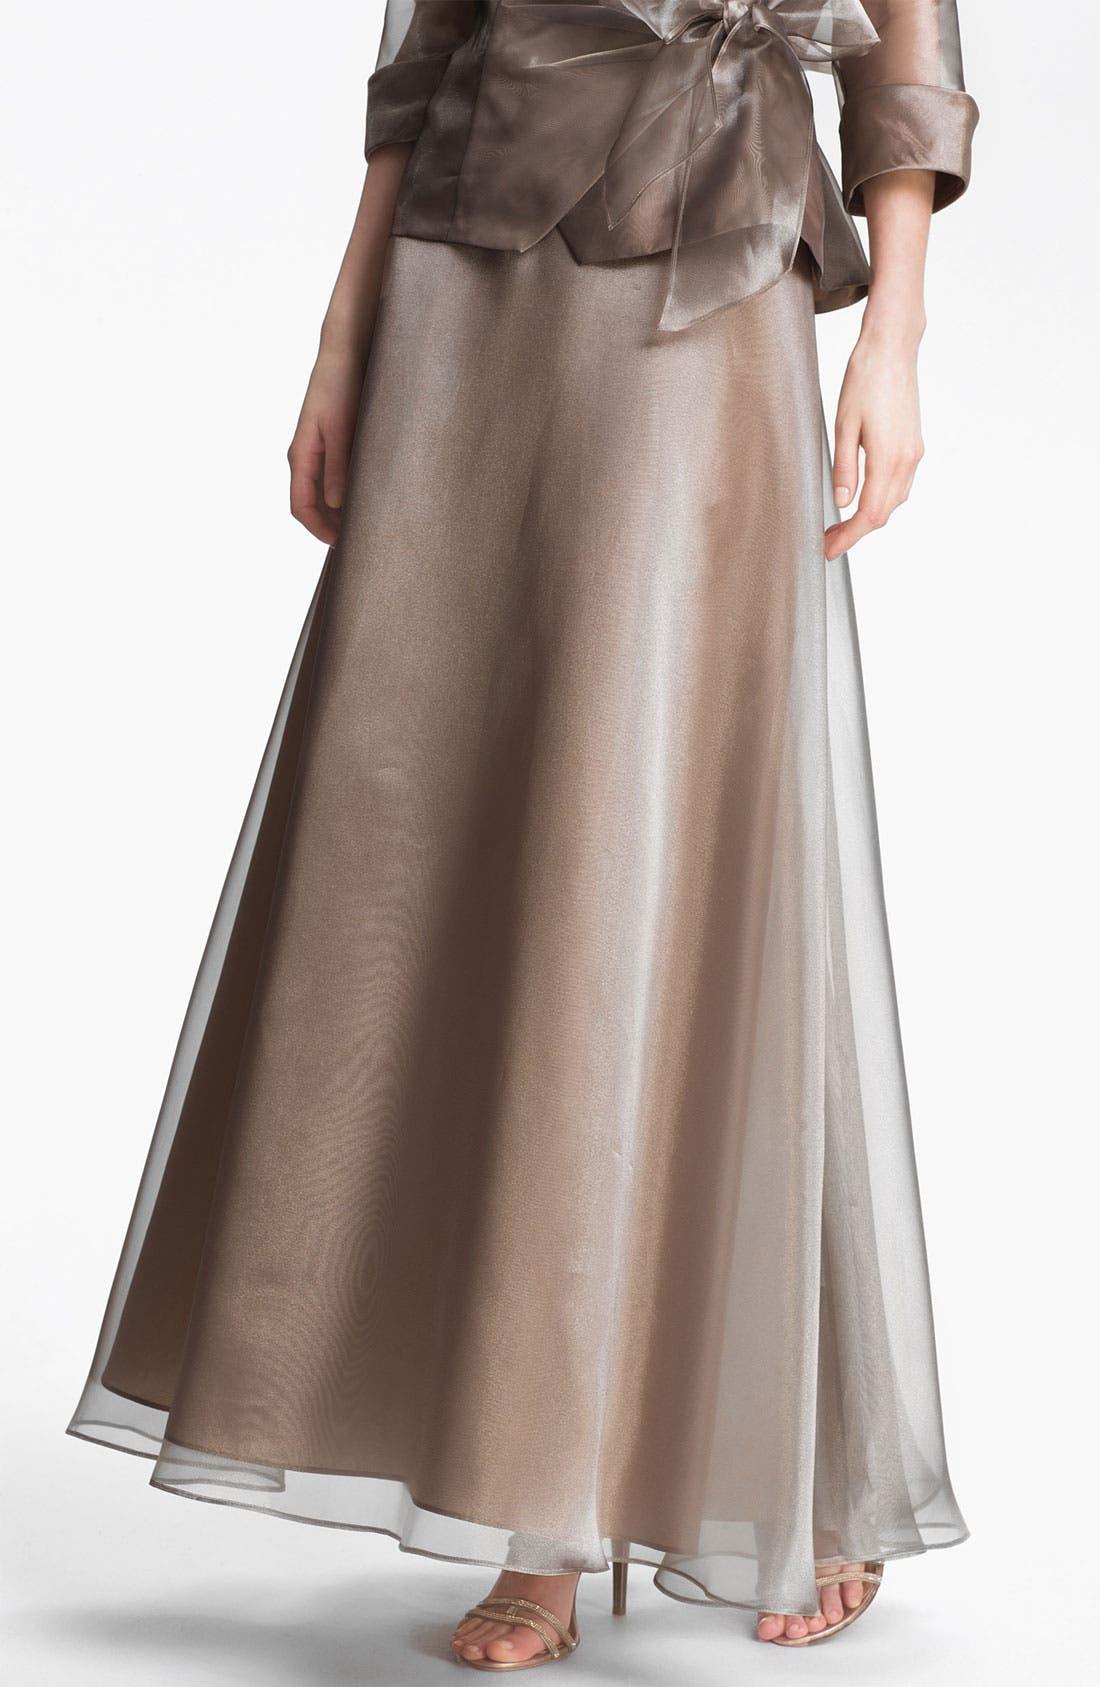 Main Image - Alex Evenings Metallic Organza Flare Skirt